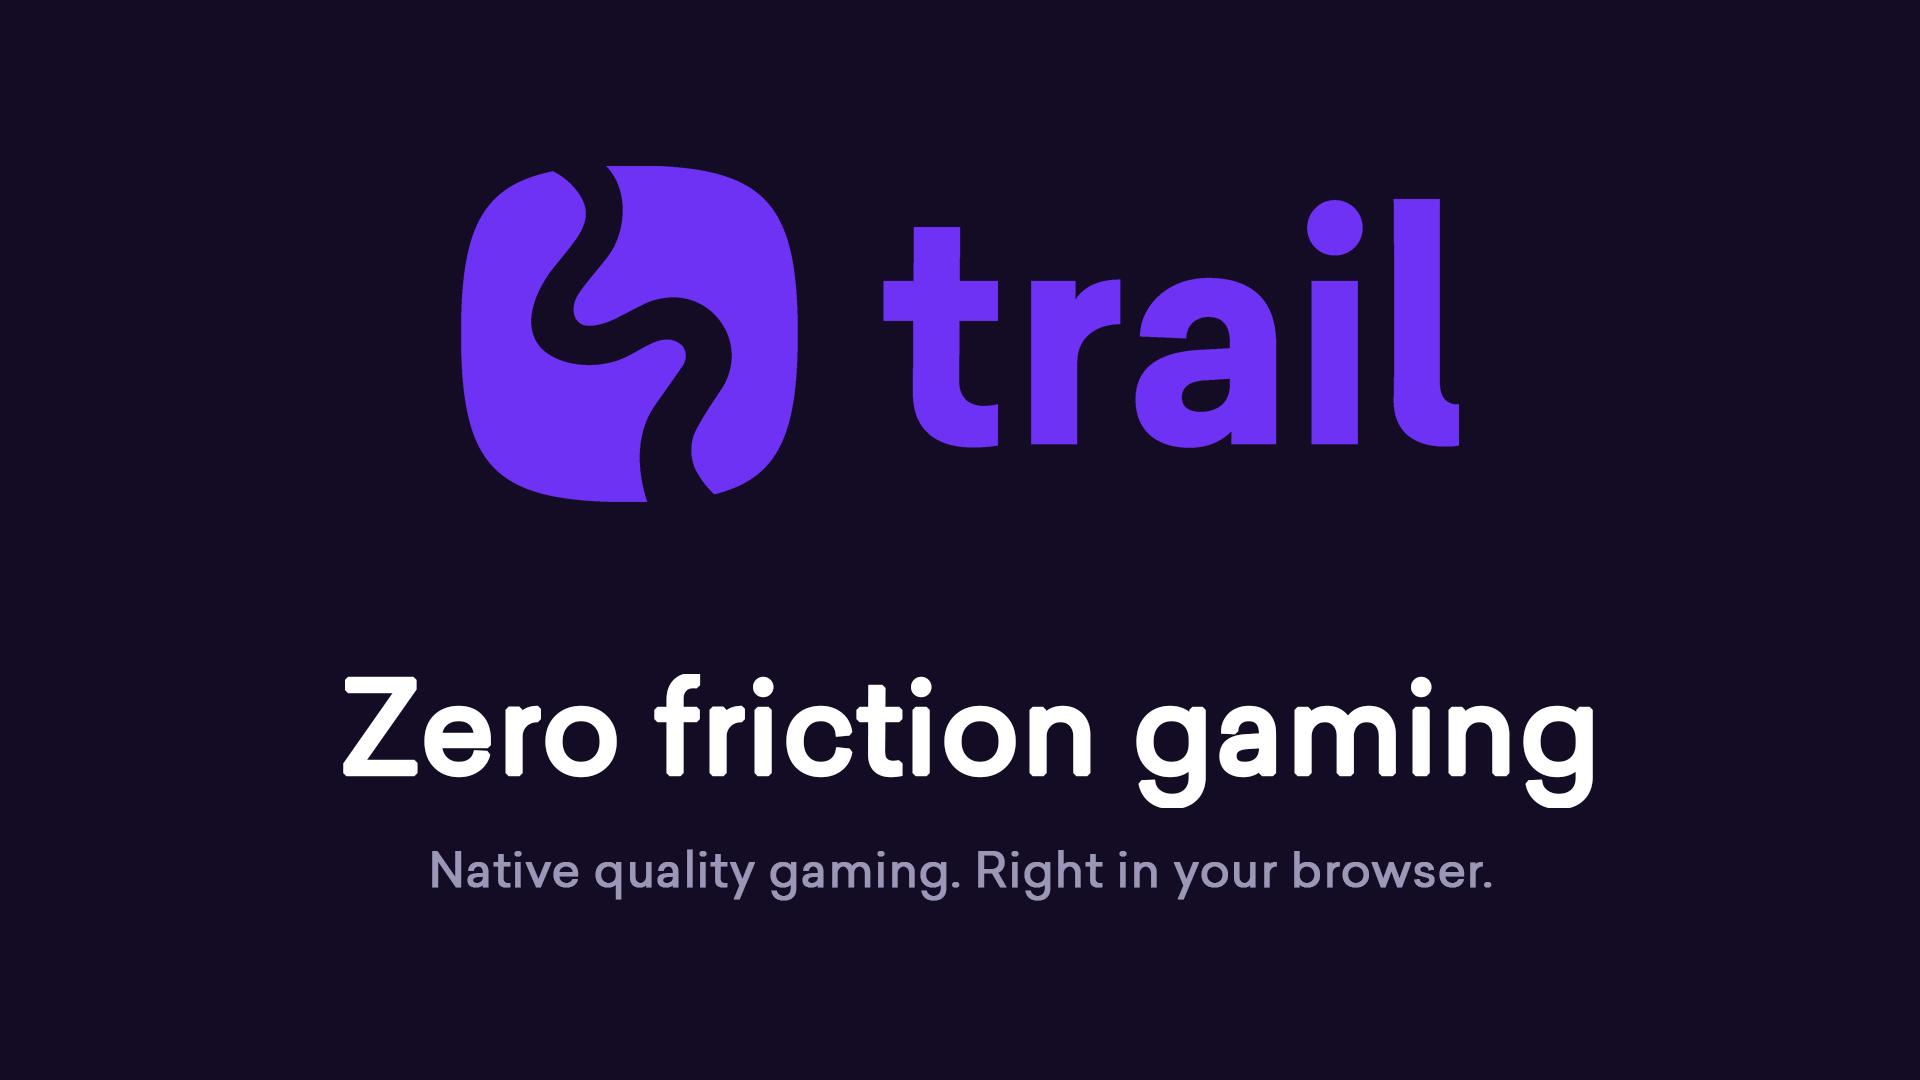 banner advertising zero friction gaming